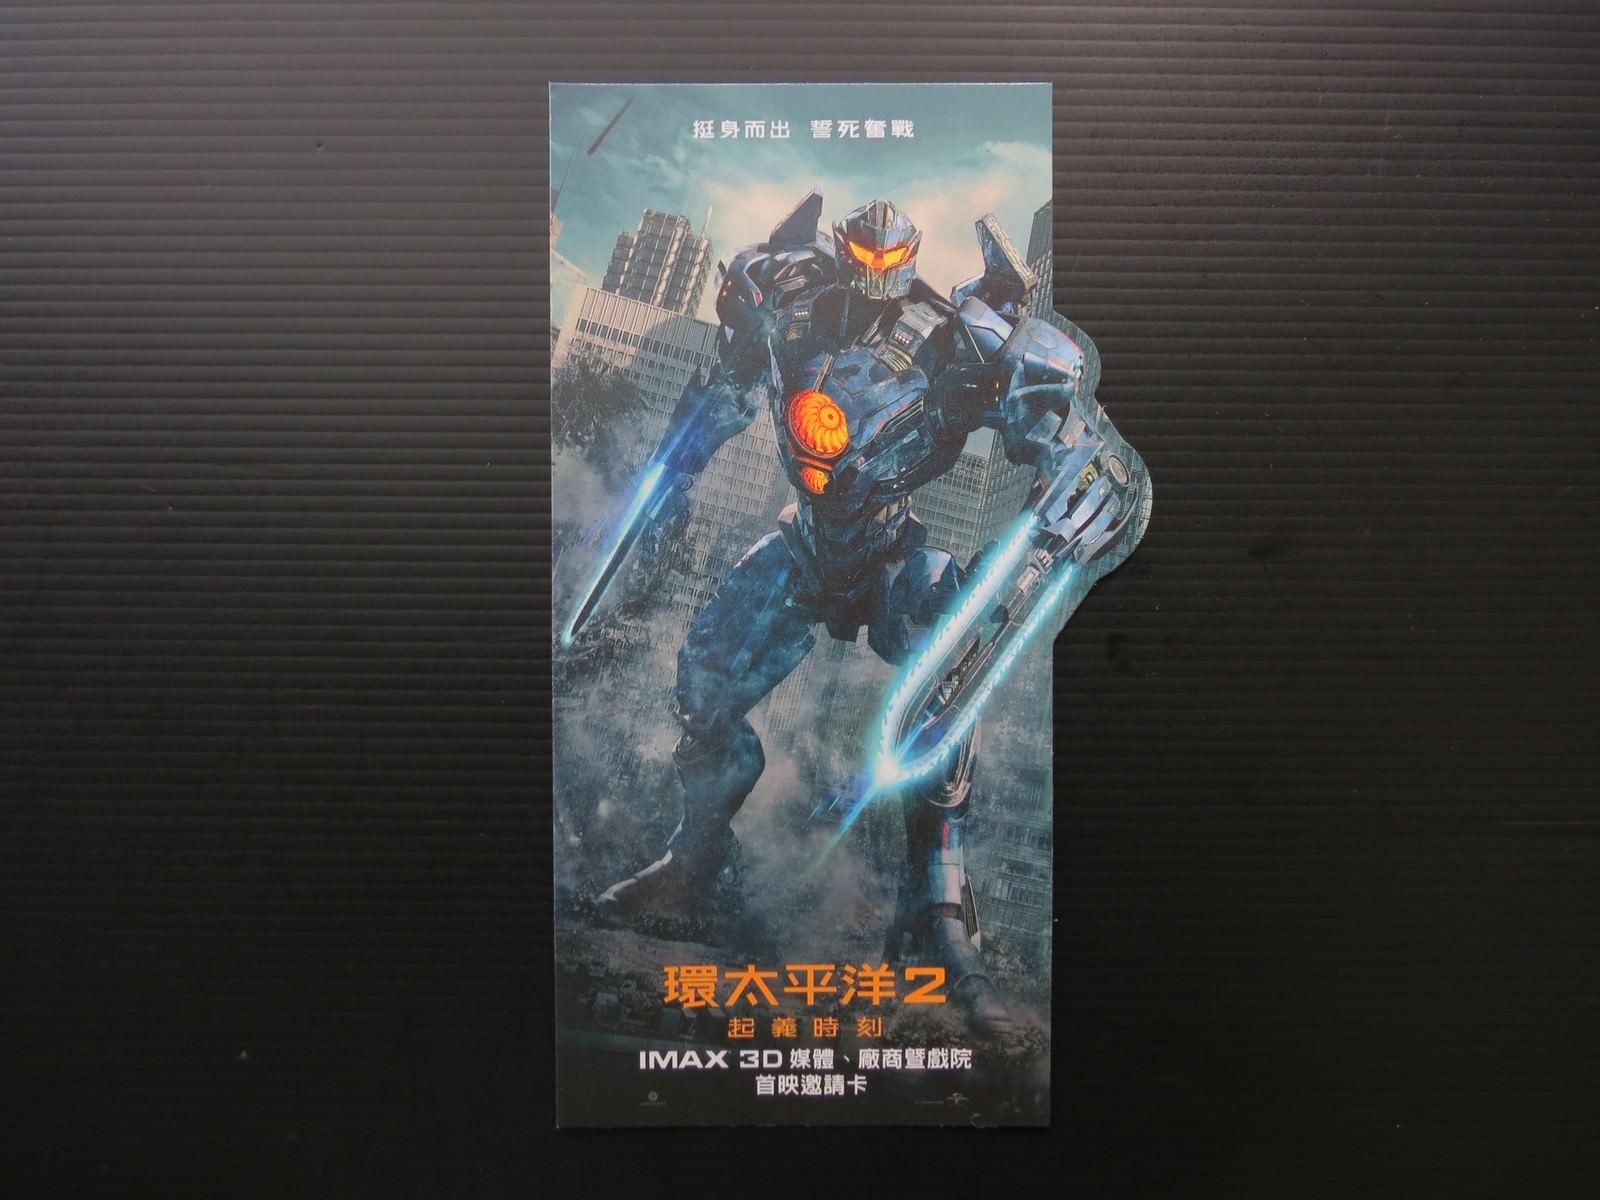 Movie, Pacific Rim: Uprising(美國) / 環太平洋2:起義時刻(台) / 环太平洋:雷霆再起(中) / 悍戰太平洋2:起義時空(港), 特映會, 邀請卡